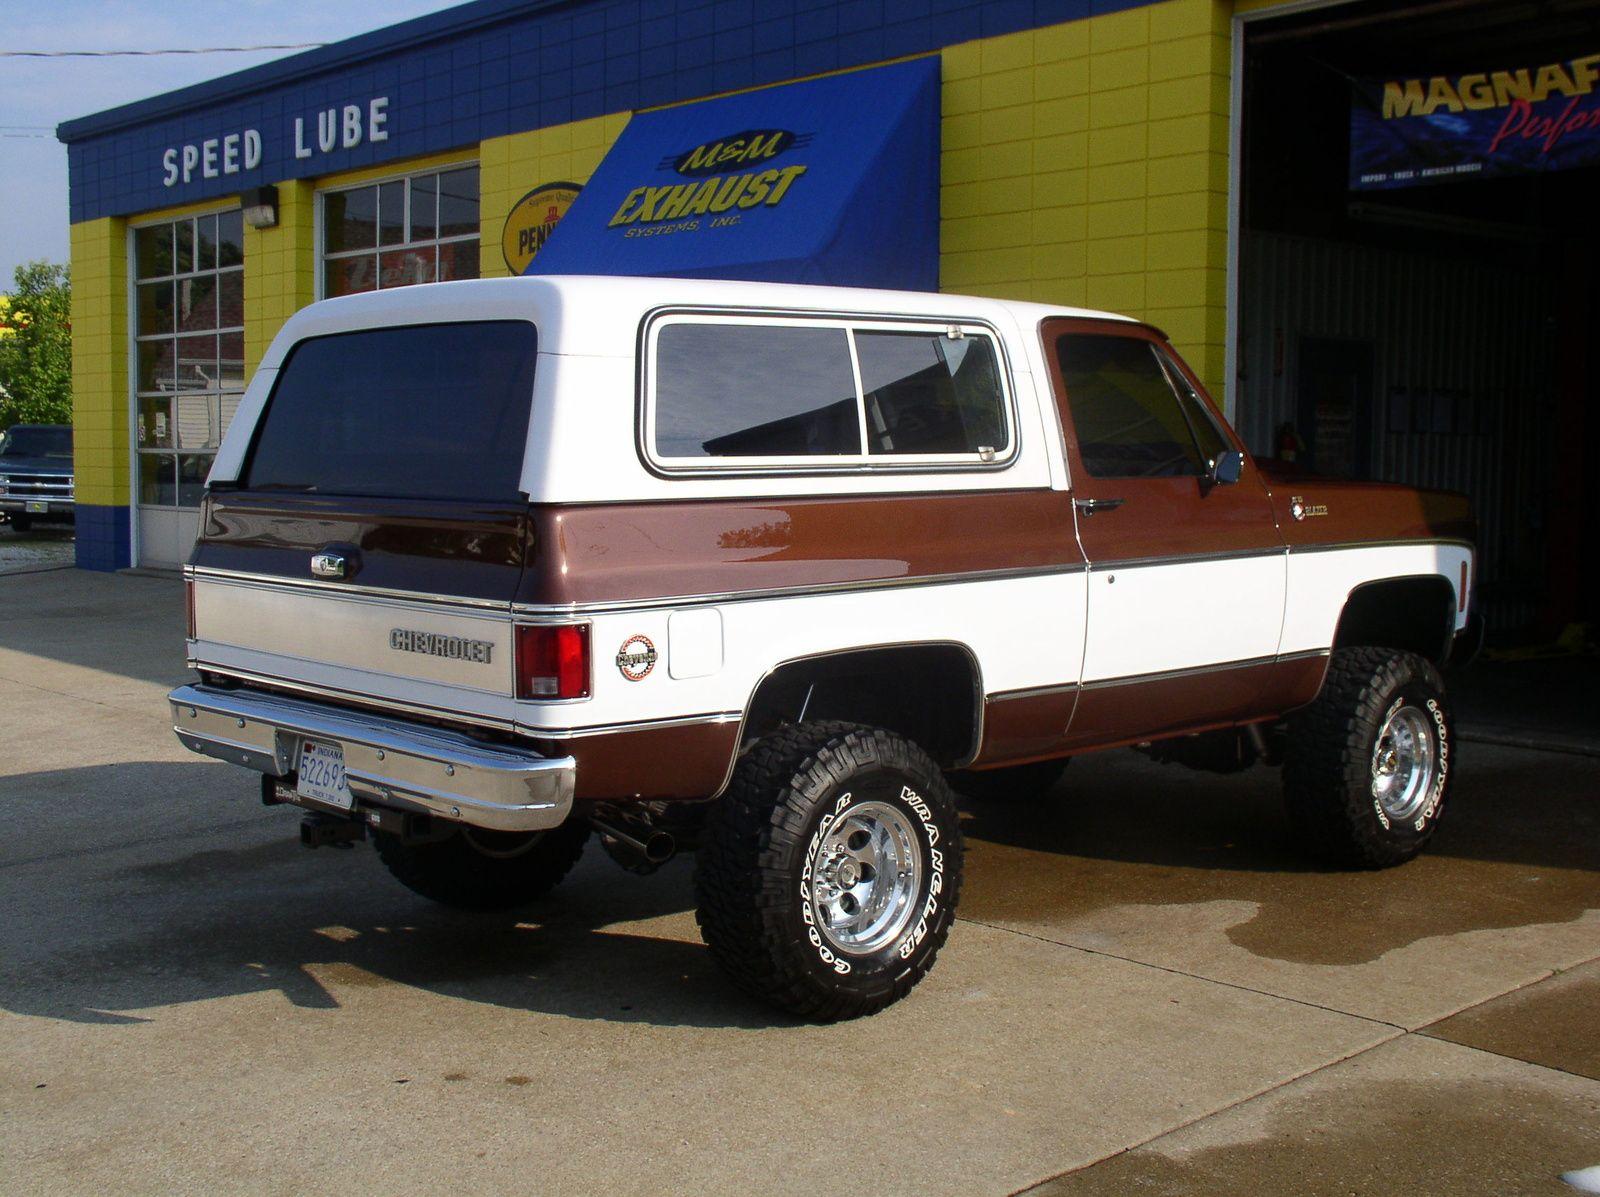 1979 Chevrolet Blazer Exterior Pictures Cargurus Chevy